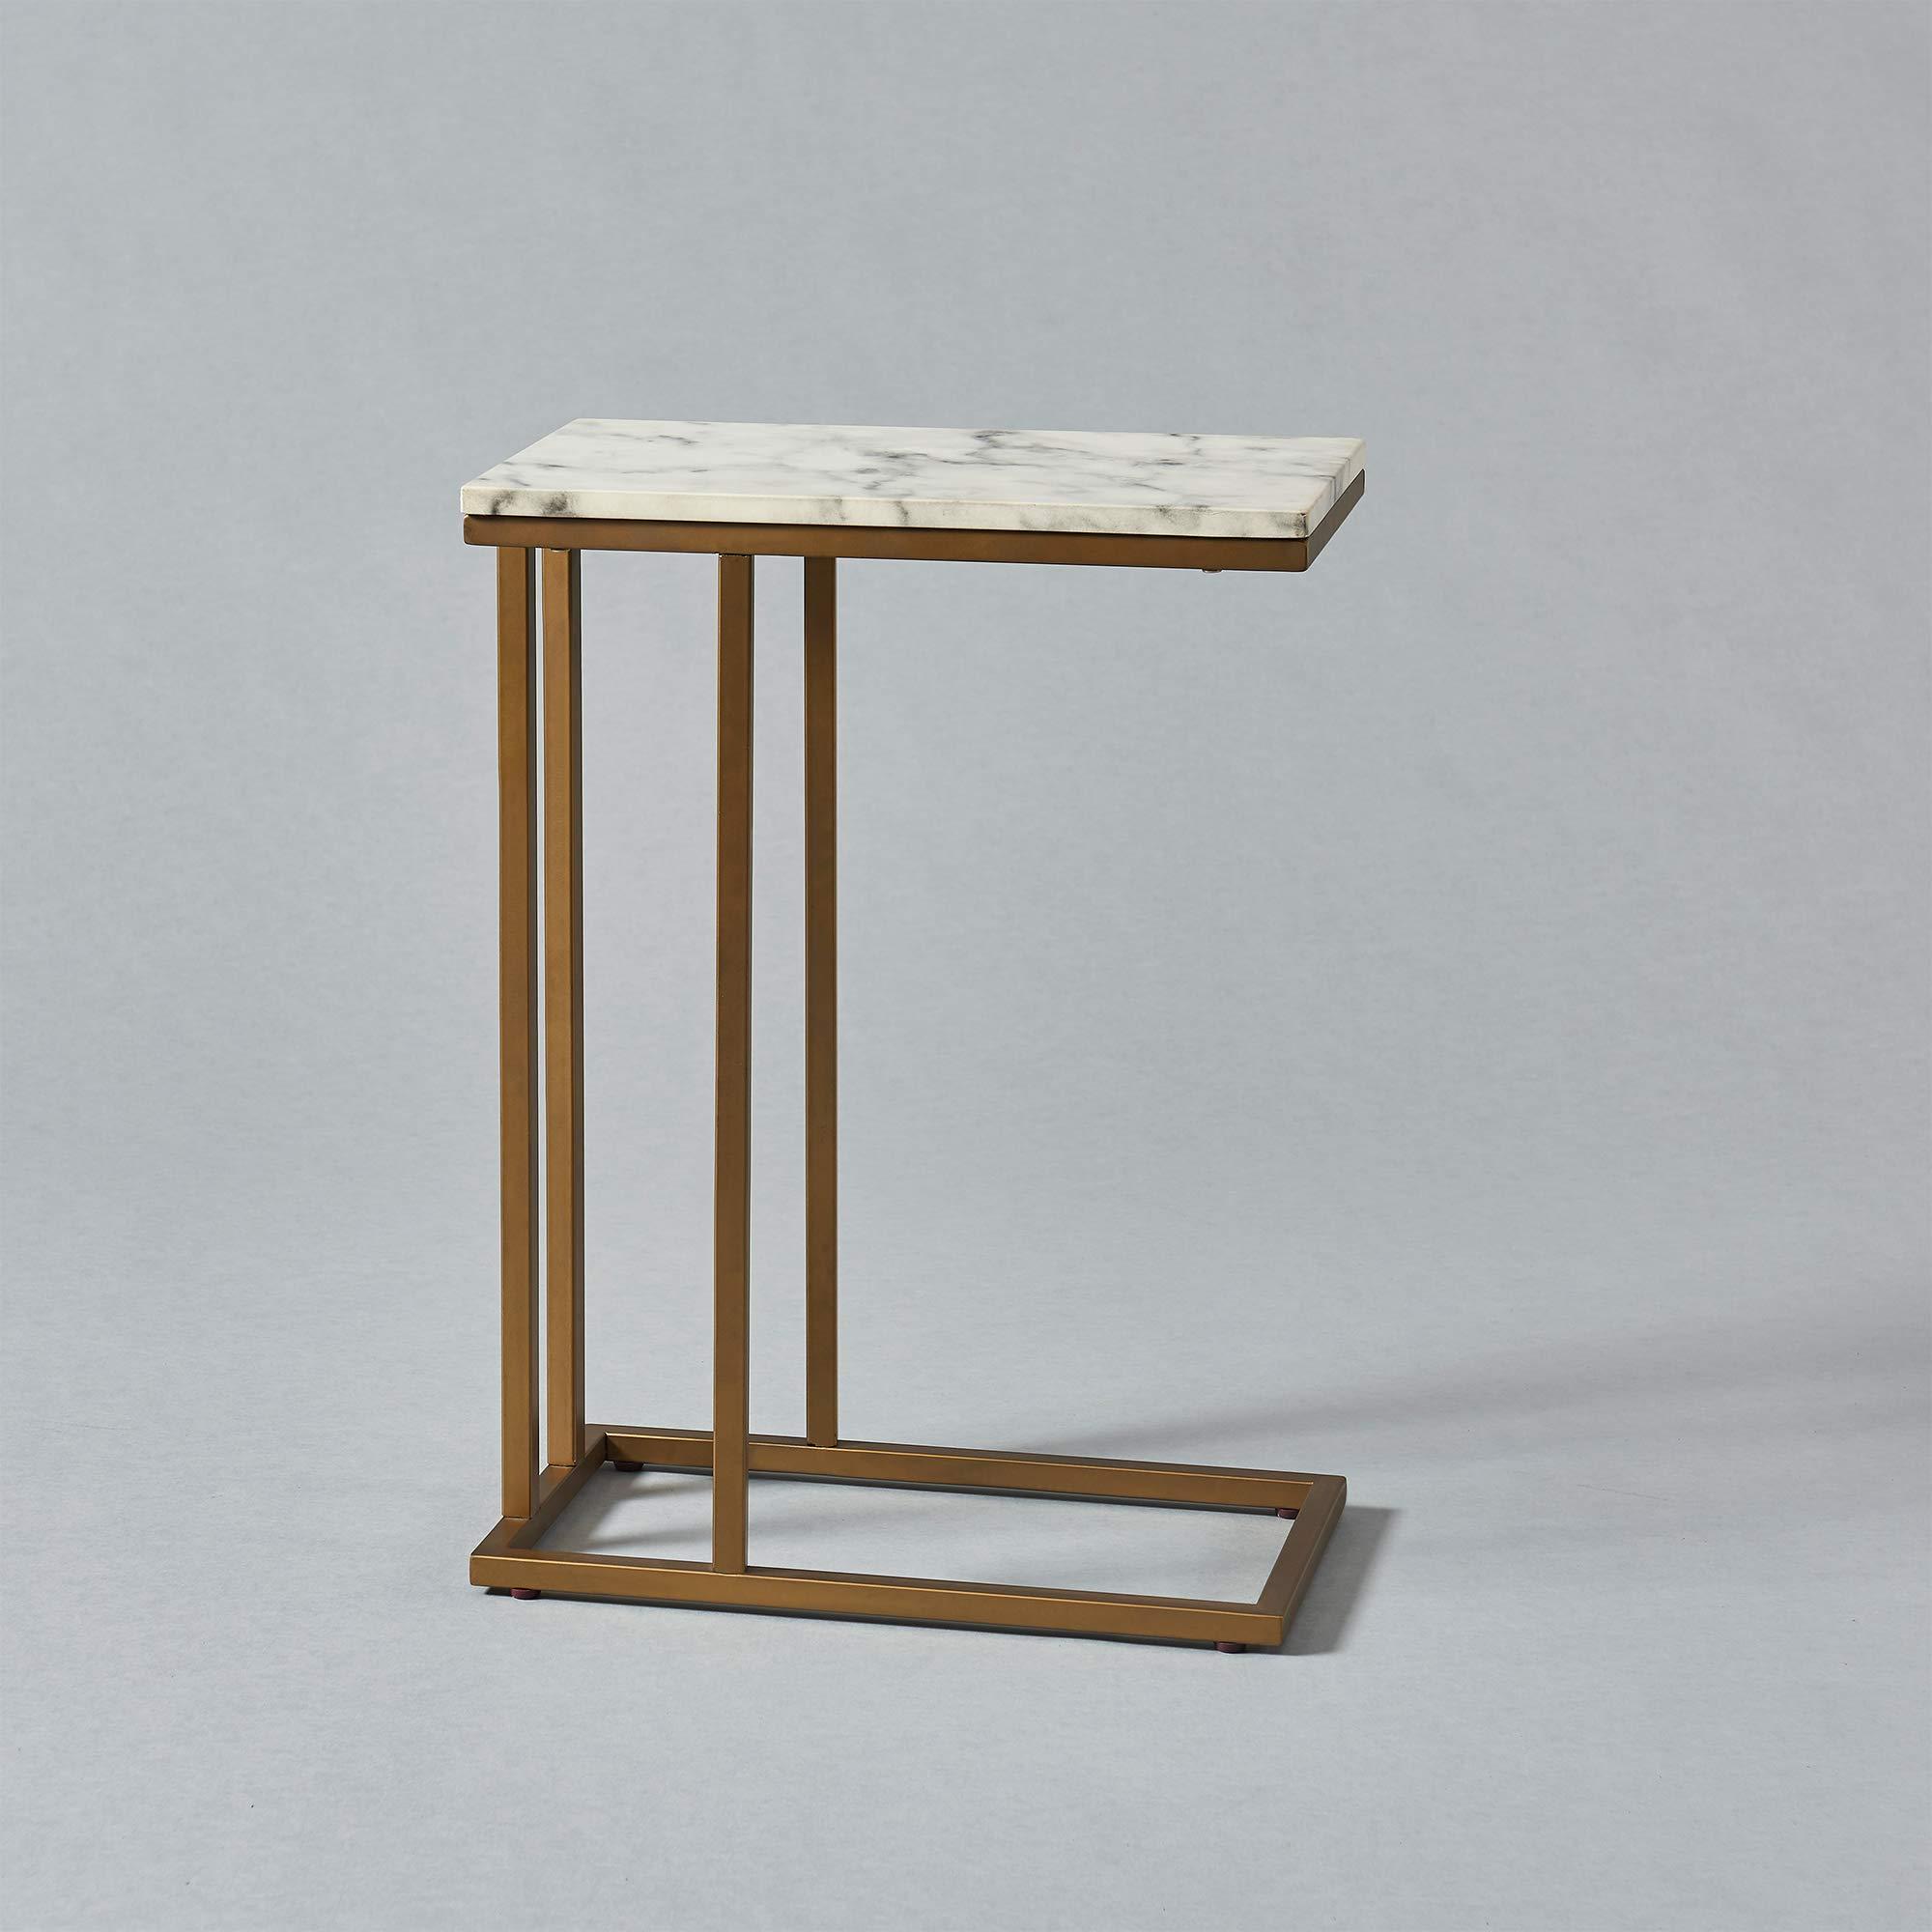 Versanora - Marmo C Shape Table - Faux Marble /Brass by Versanora (Image #12)